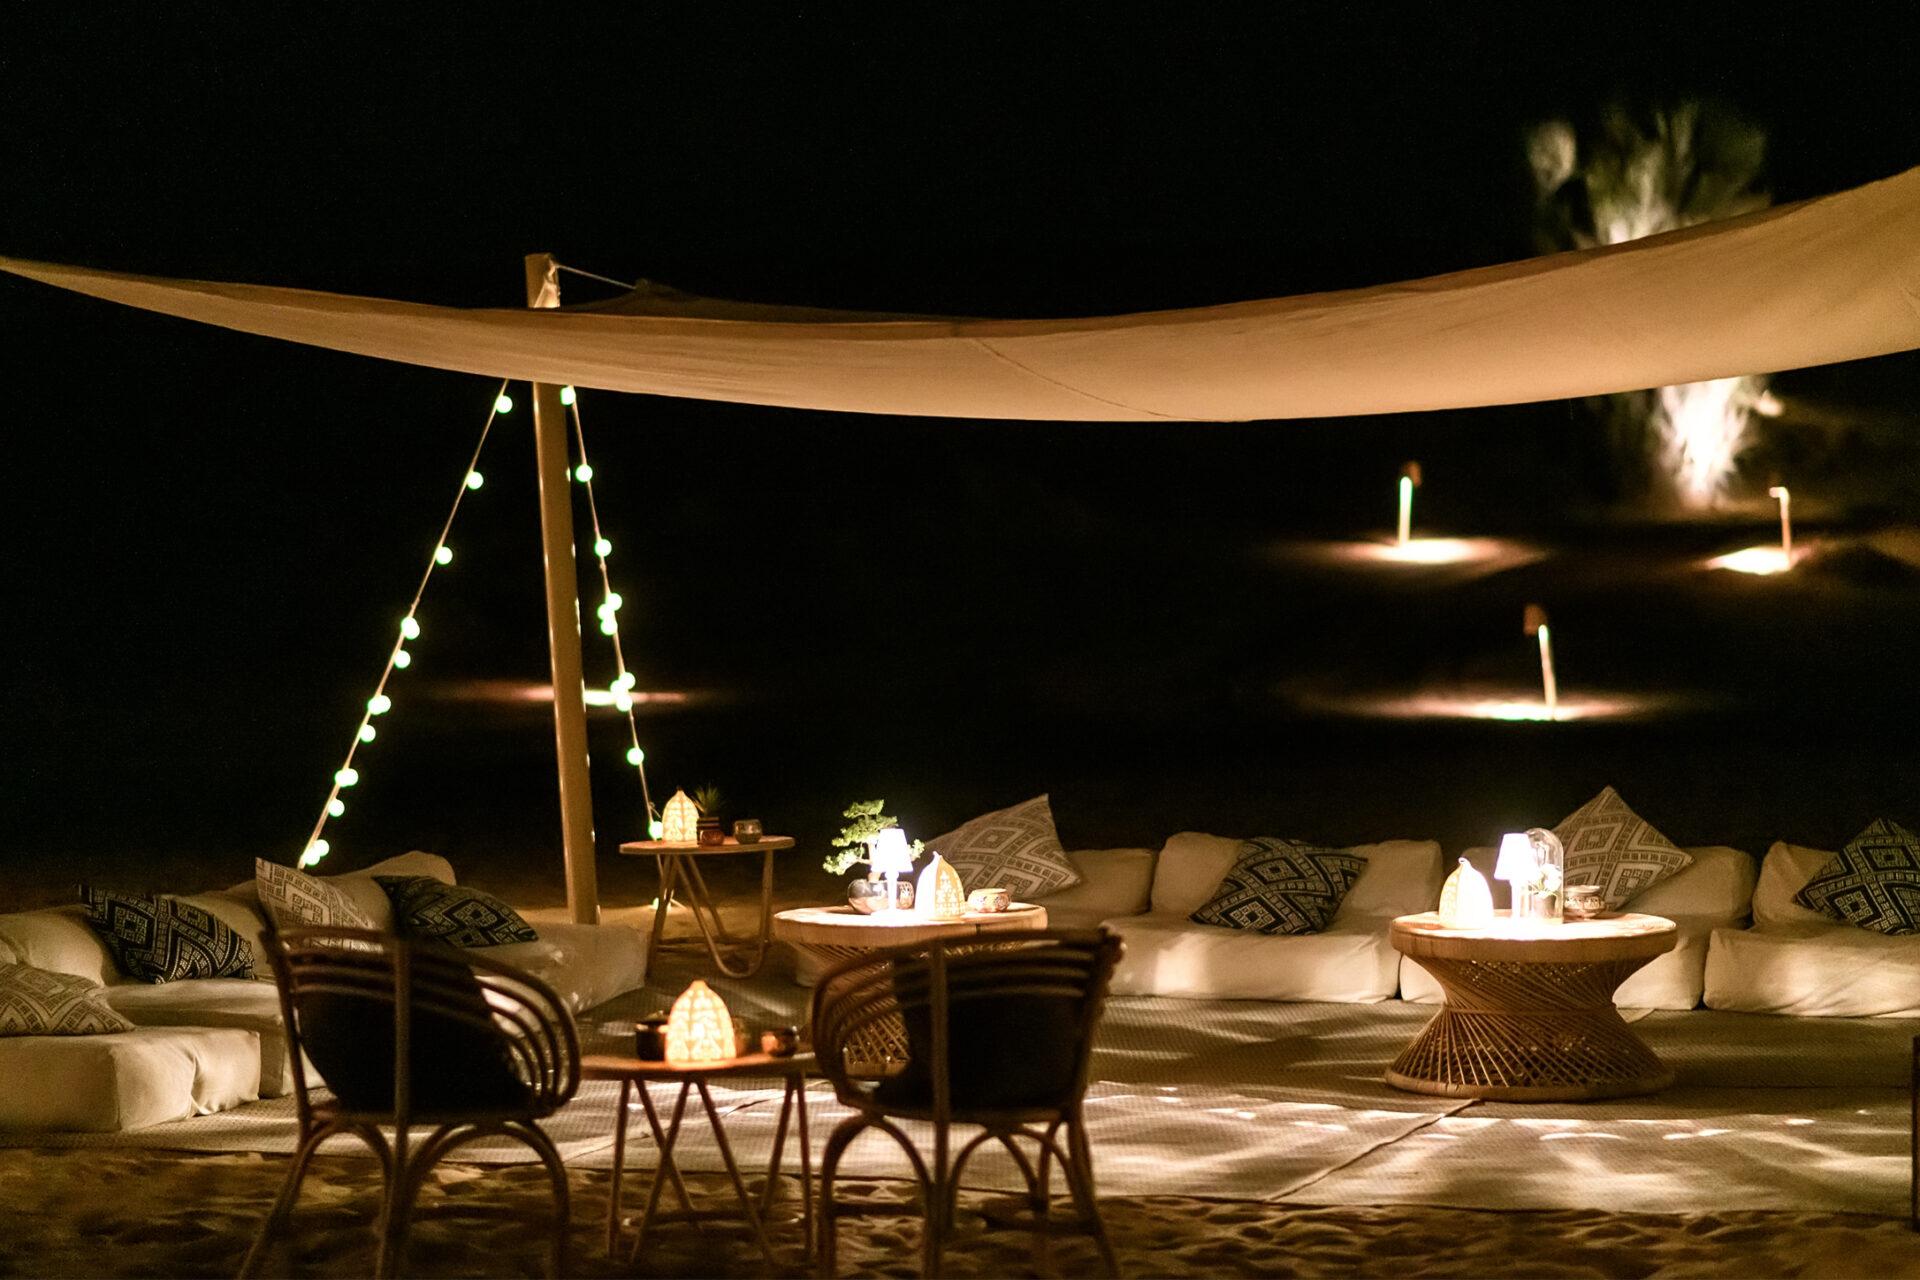 Nara Desert Escape - Dreamy Decadence in the Dubai Desert